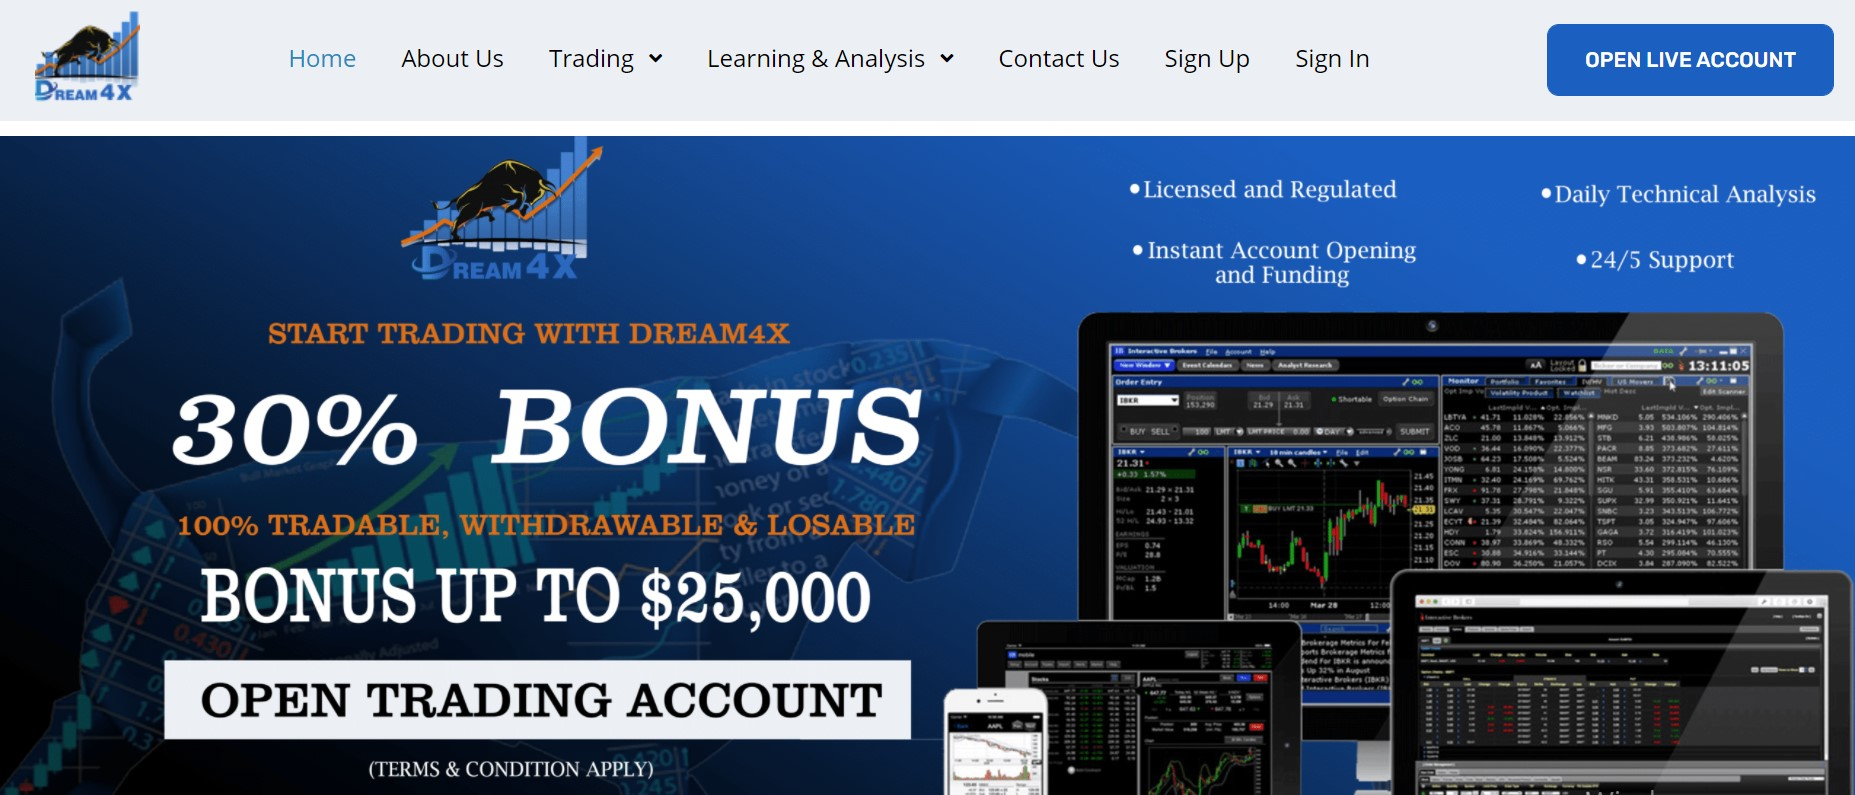 Dream4x website